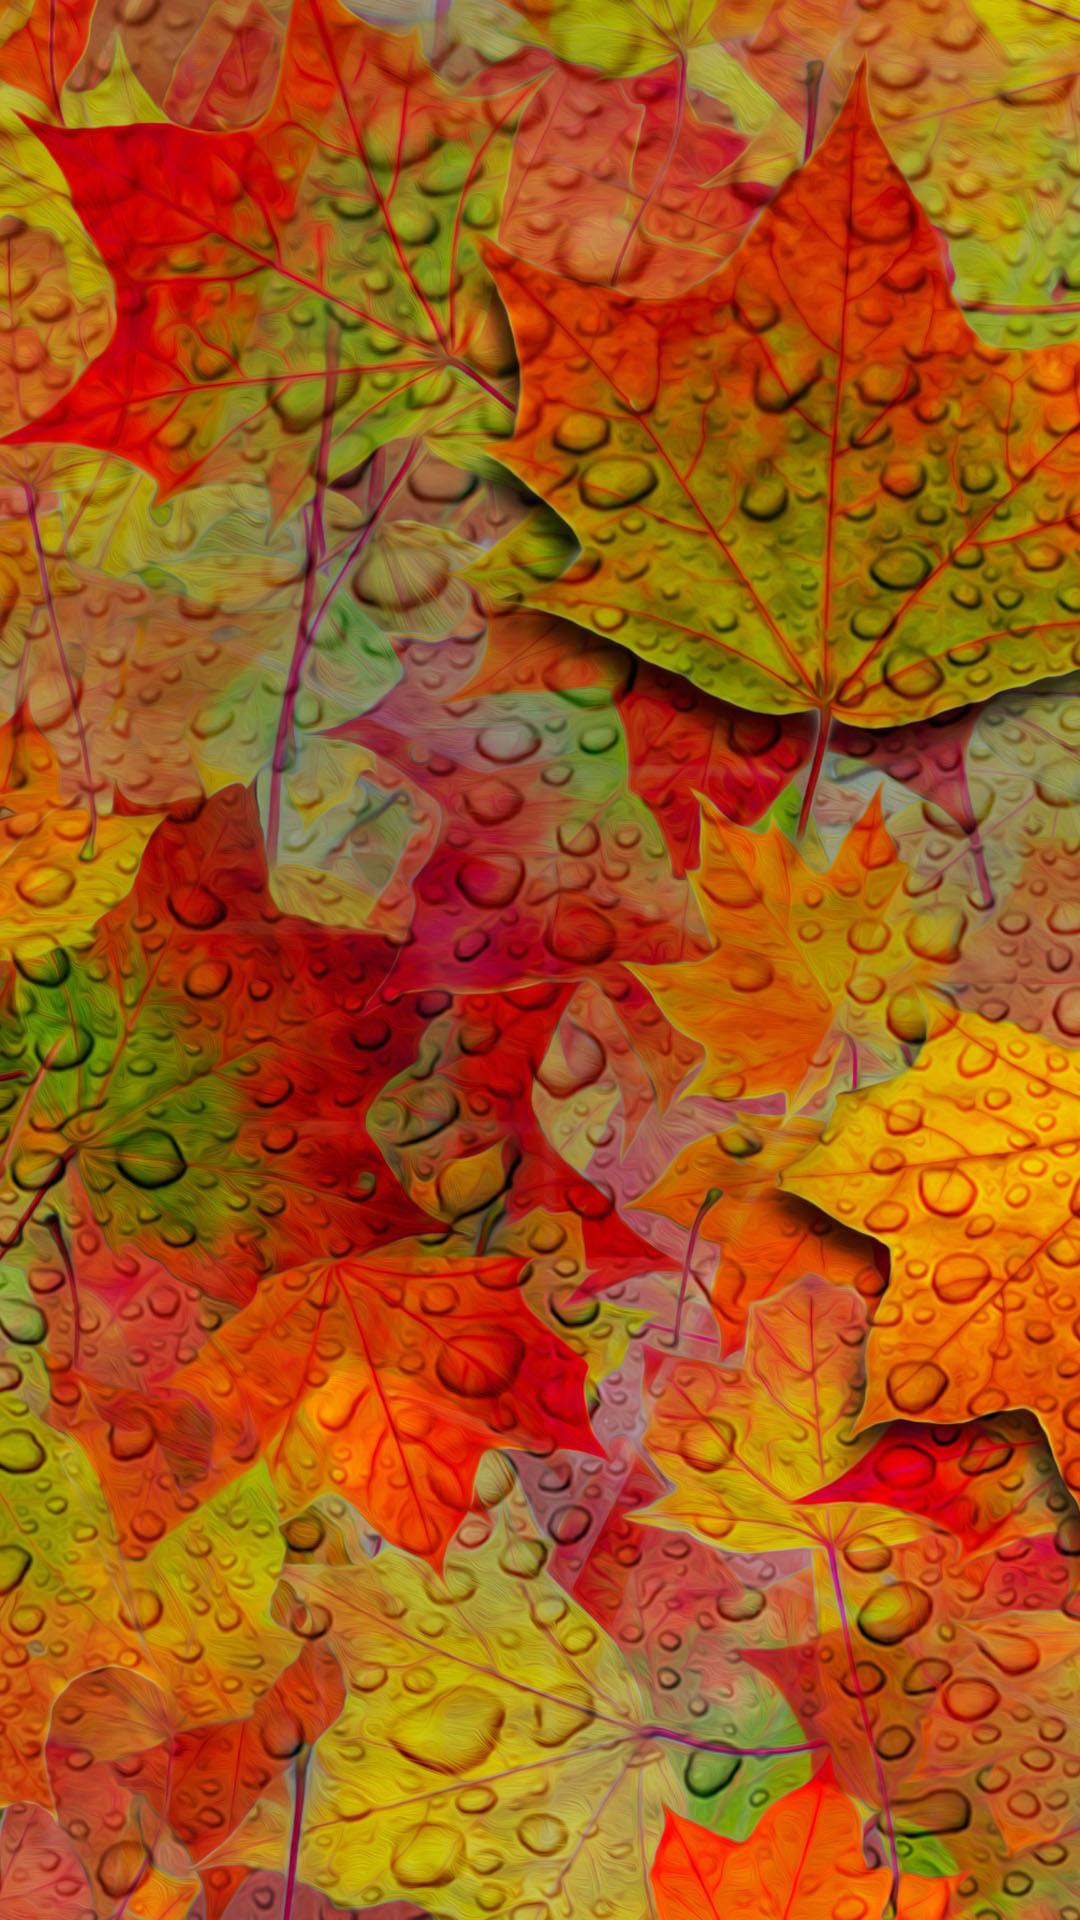 Fall Leaves Phone Wallpaper Art Fall Iphone Wallpapers Pixelstalk Net